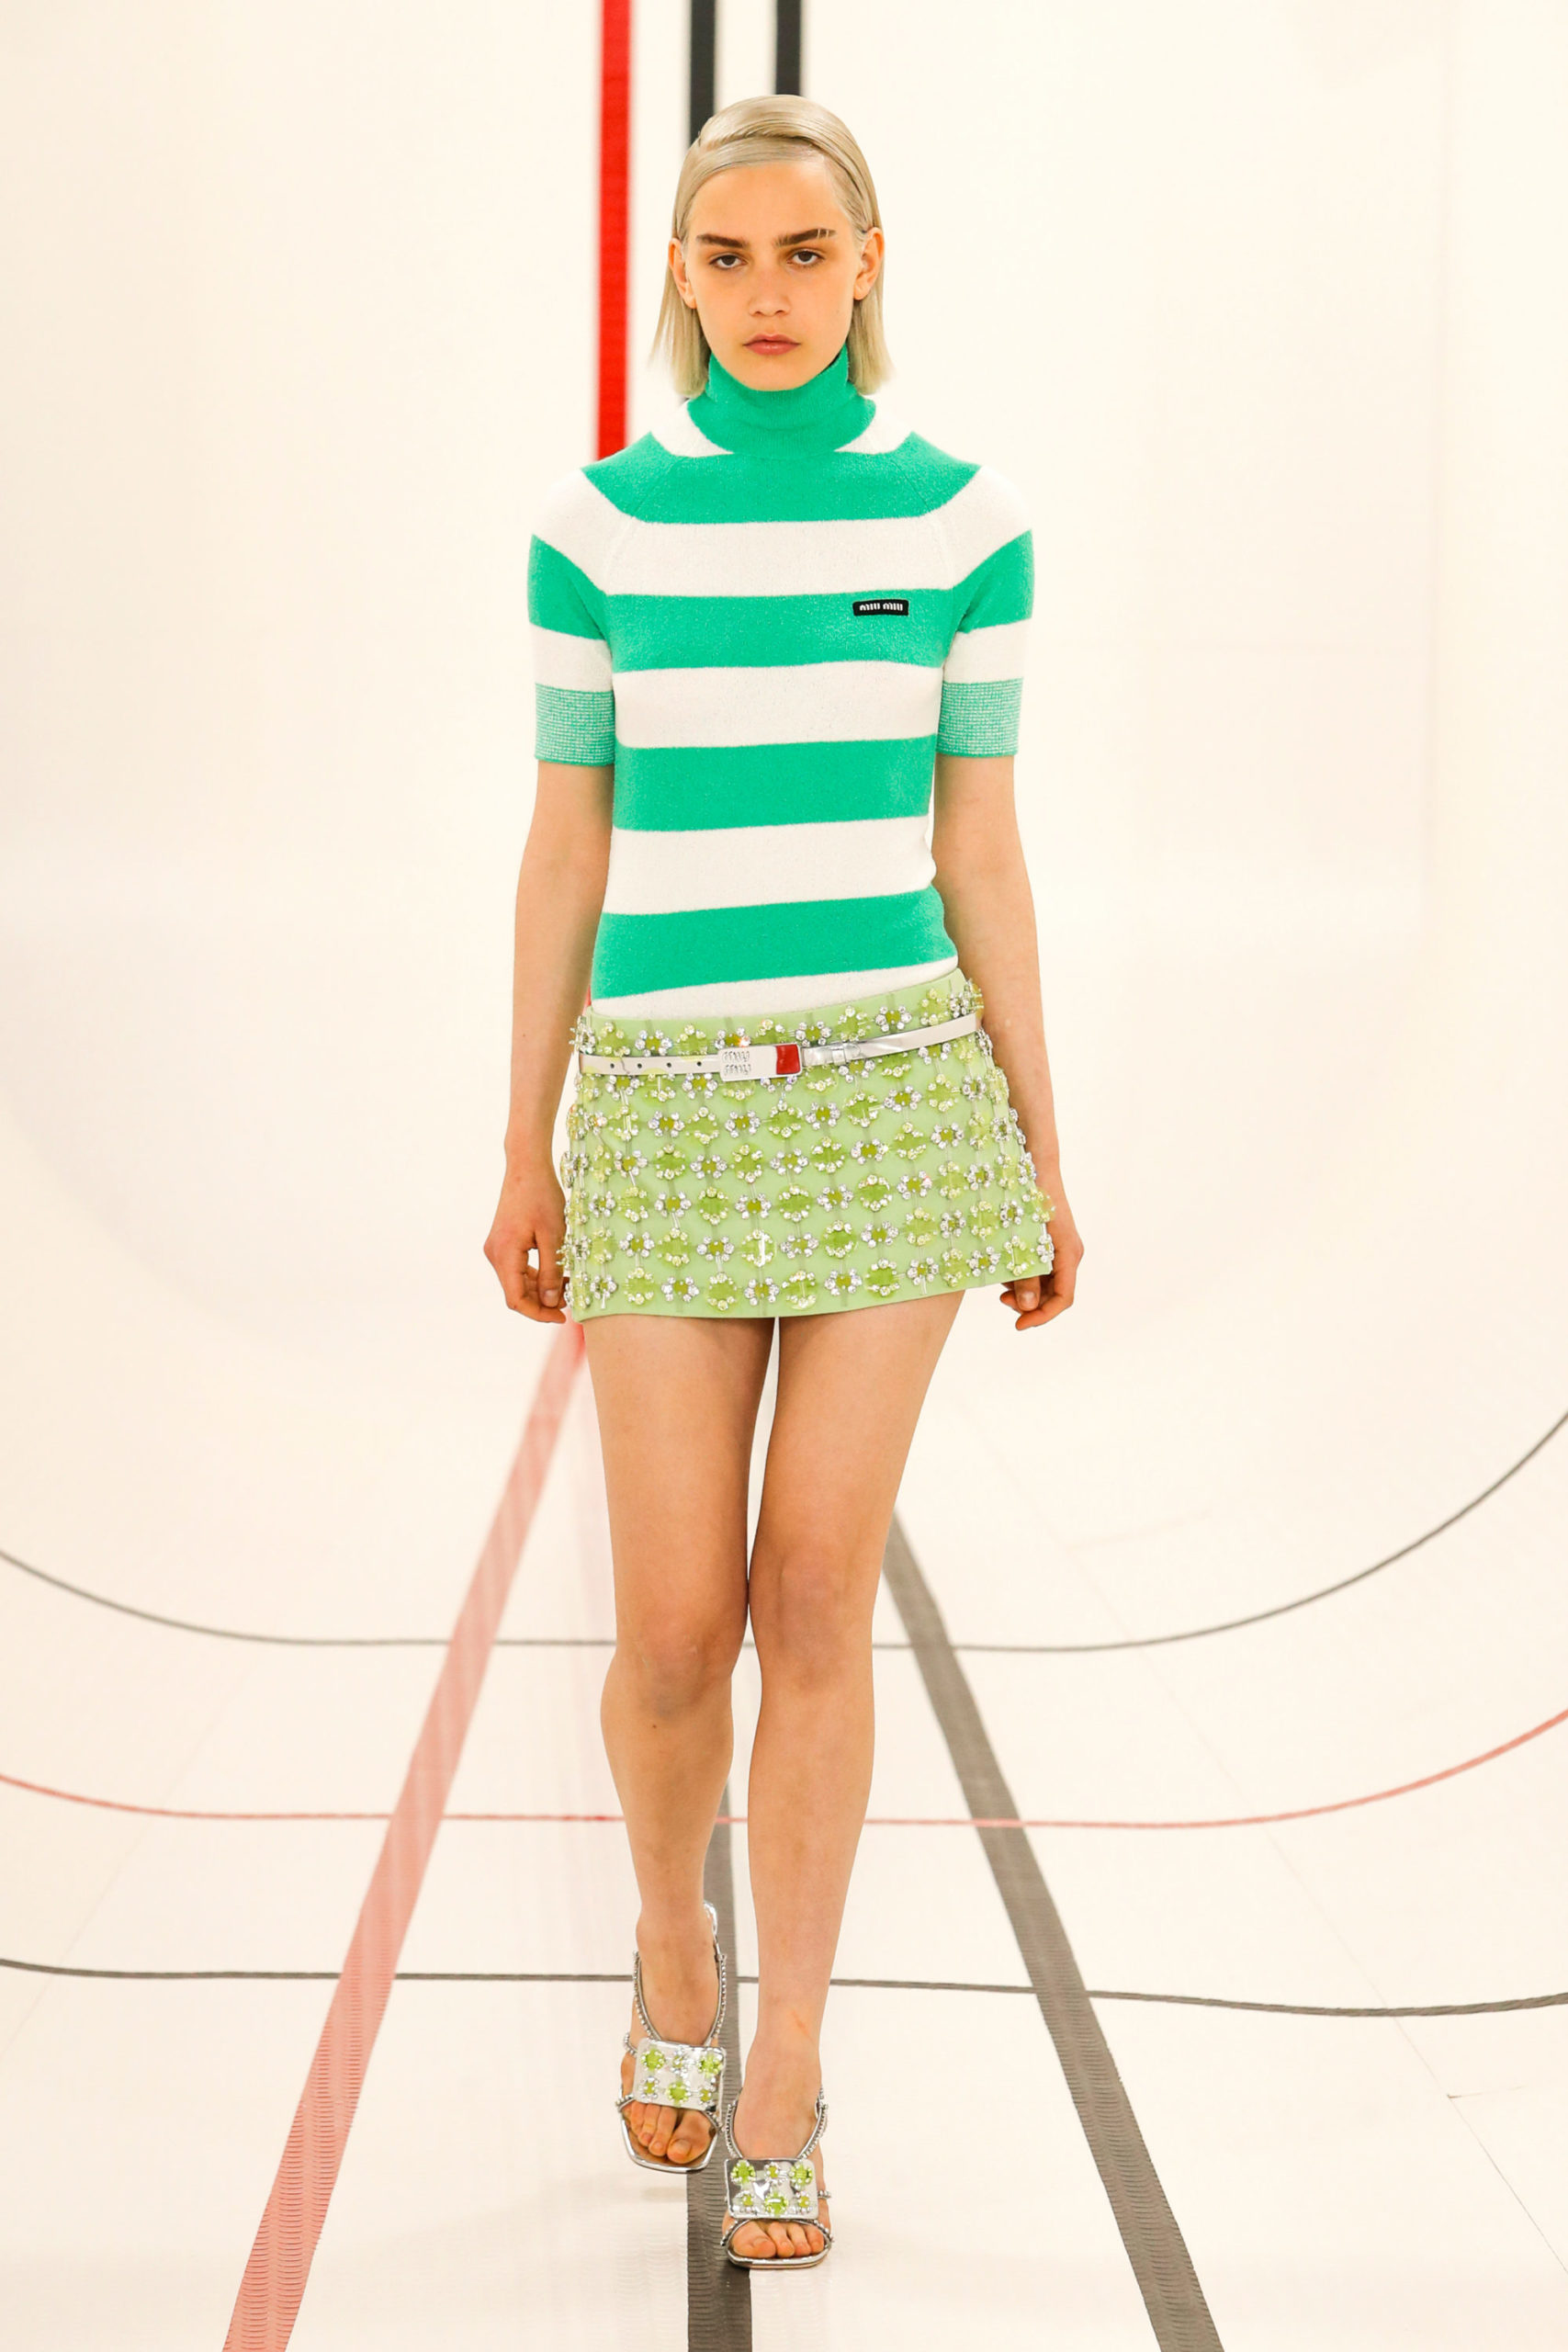 Ментоловый образ от Miu Miu Ready To Wear весна-лето 2021